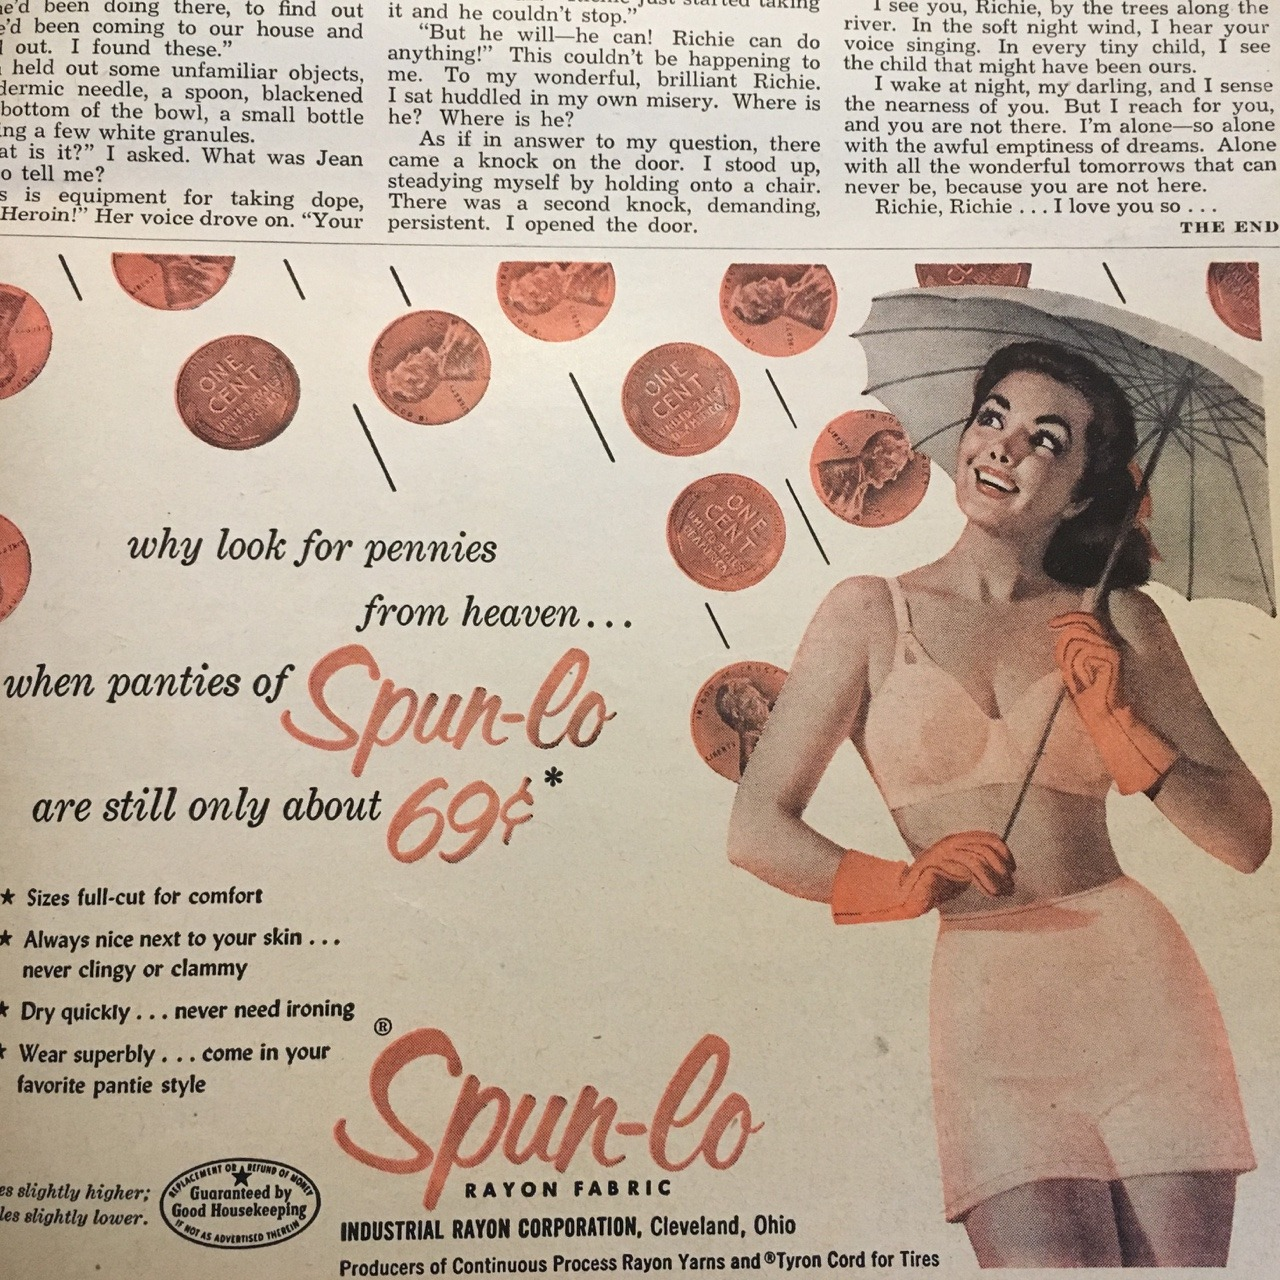 Spun-lo Rayon Fabric  True Story. May 1953